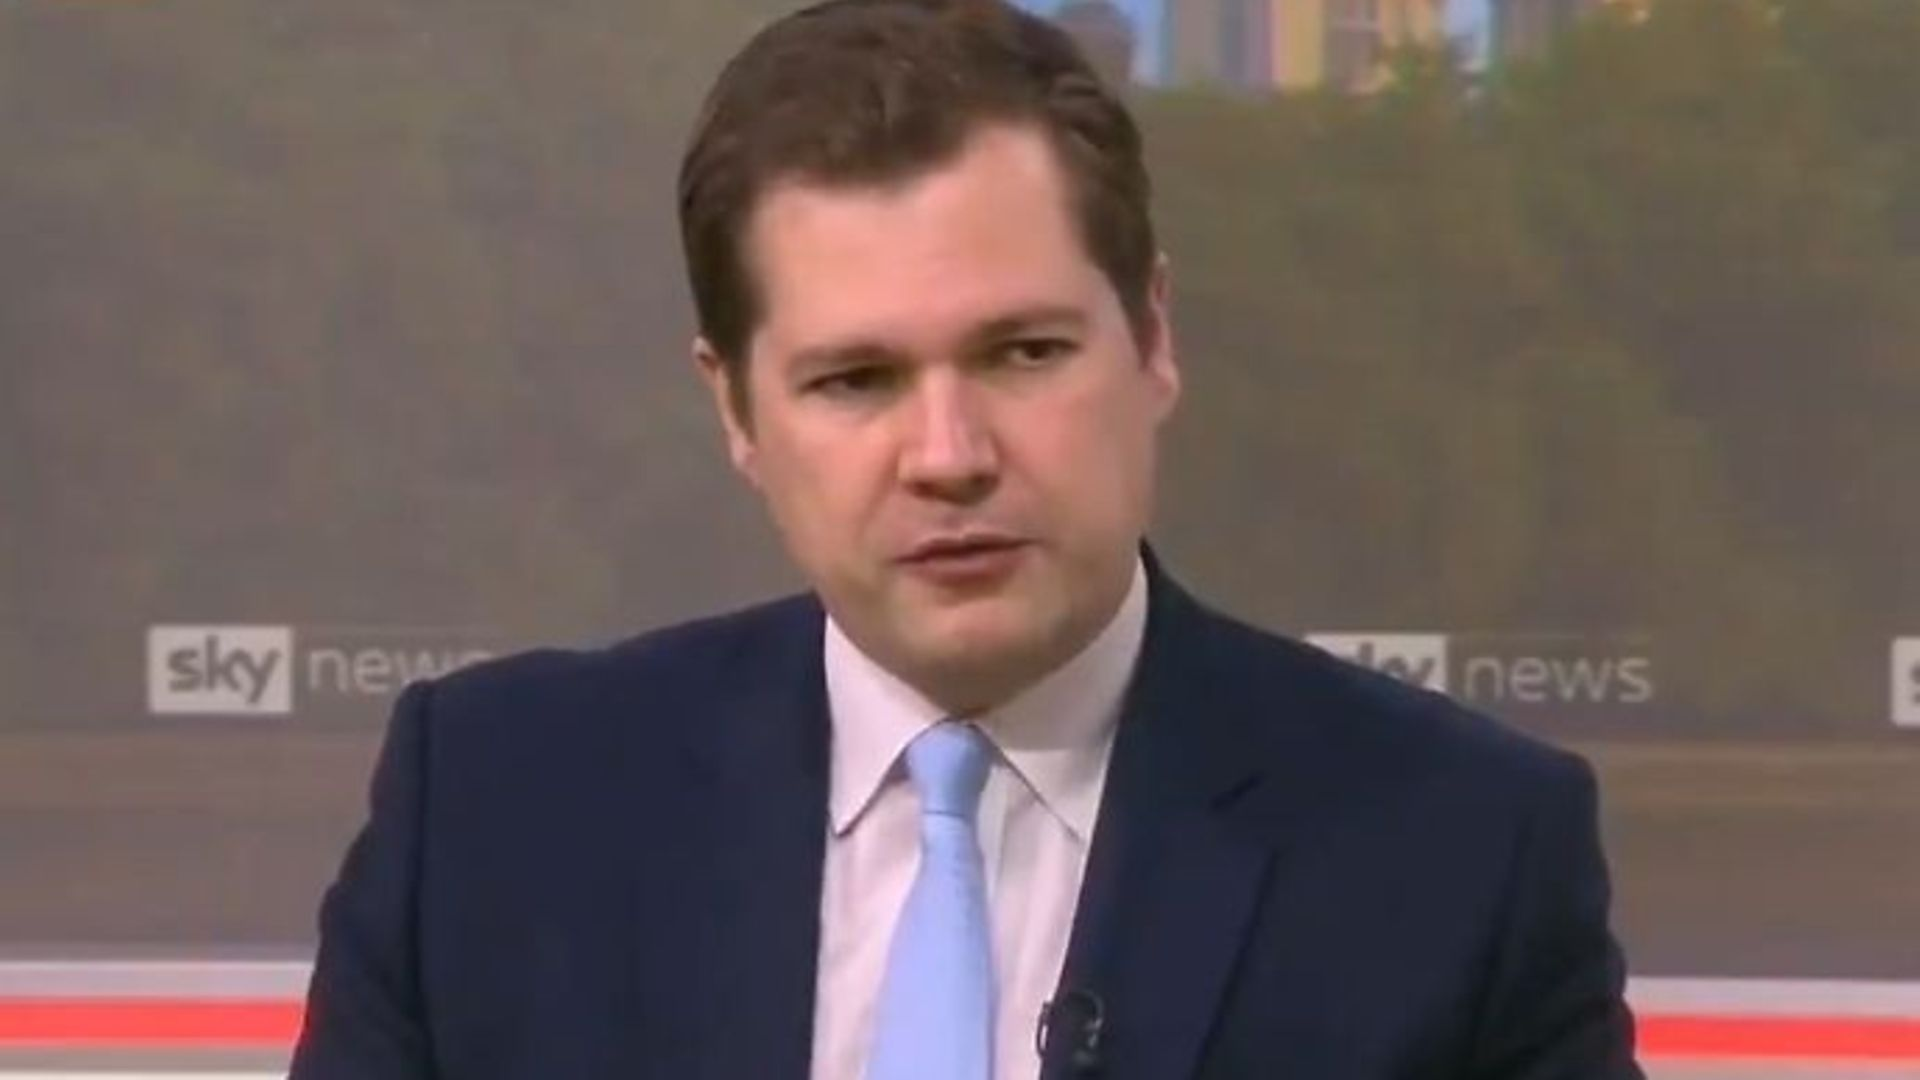 Tory cabinet minister Robert Jenrick on Sky News - Credit: Sky News, Twitter